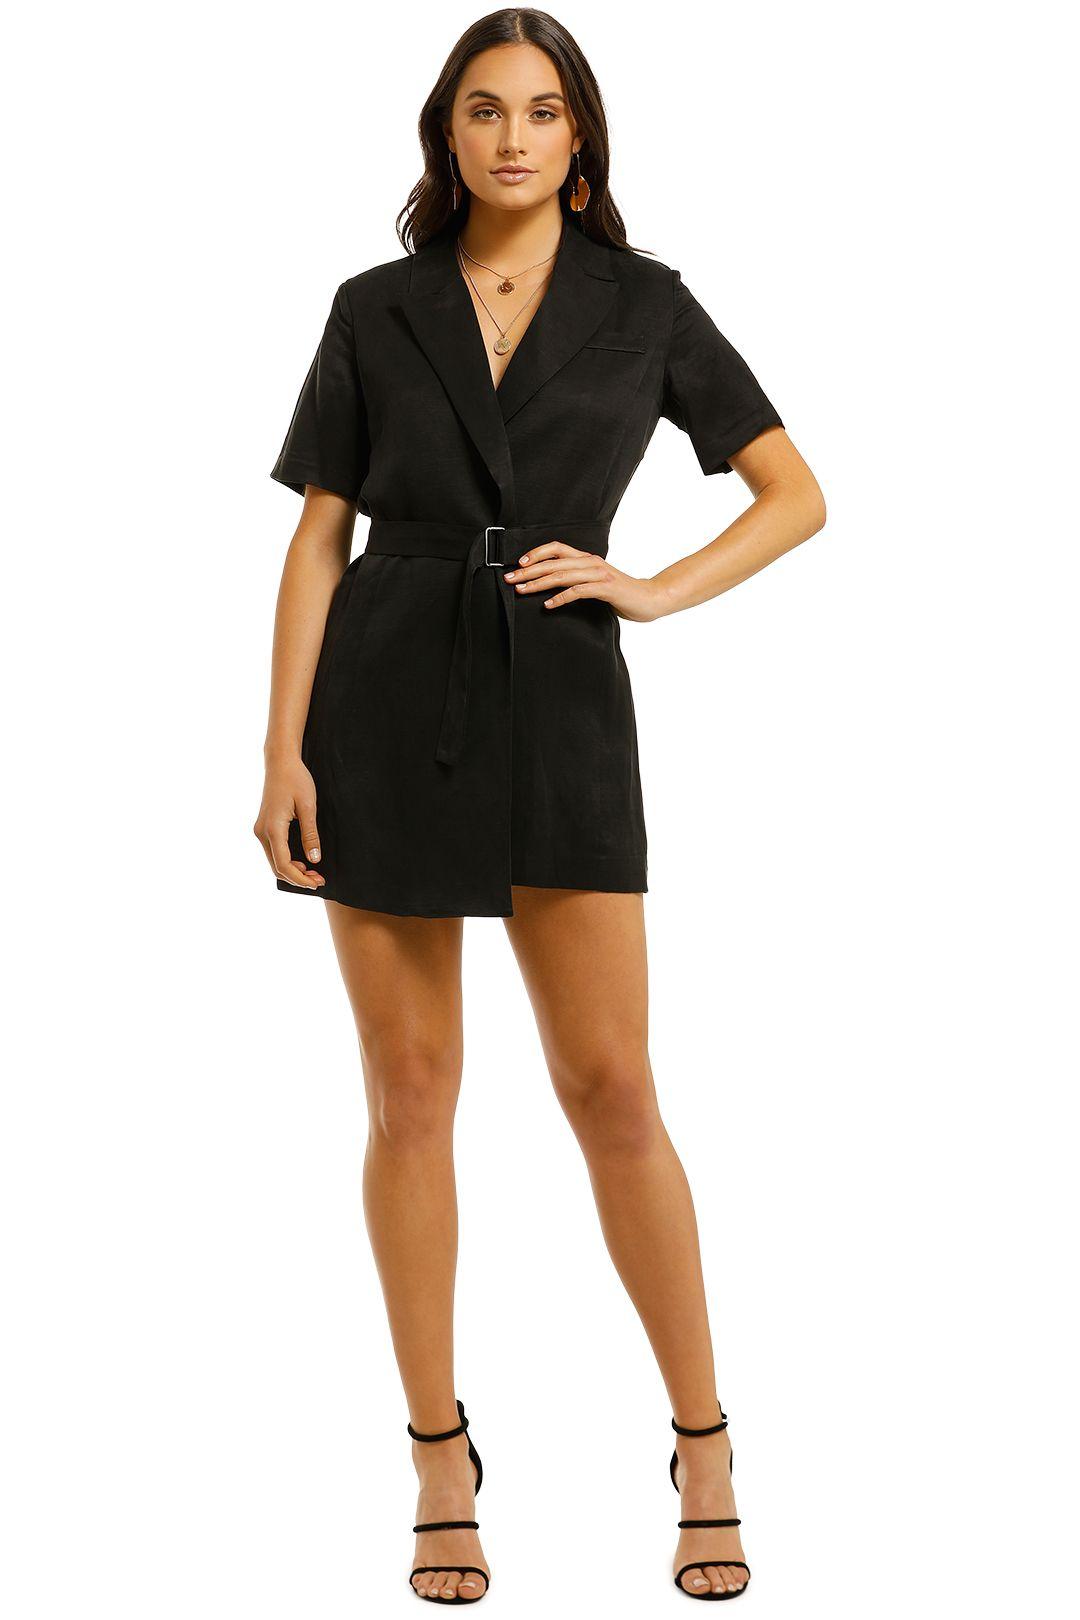 Third-Form-TCB-Blazer-Dress-Black-Front